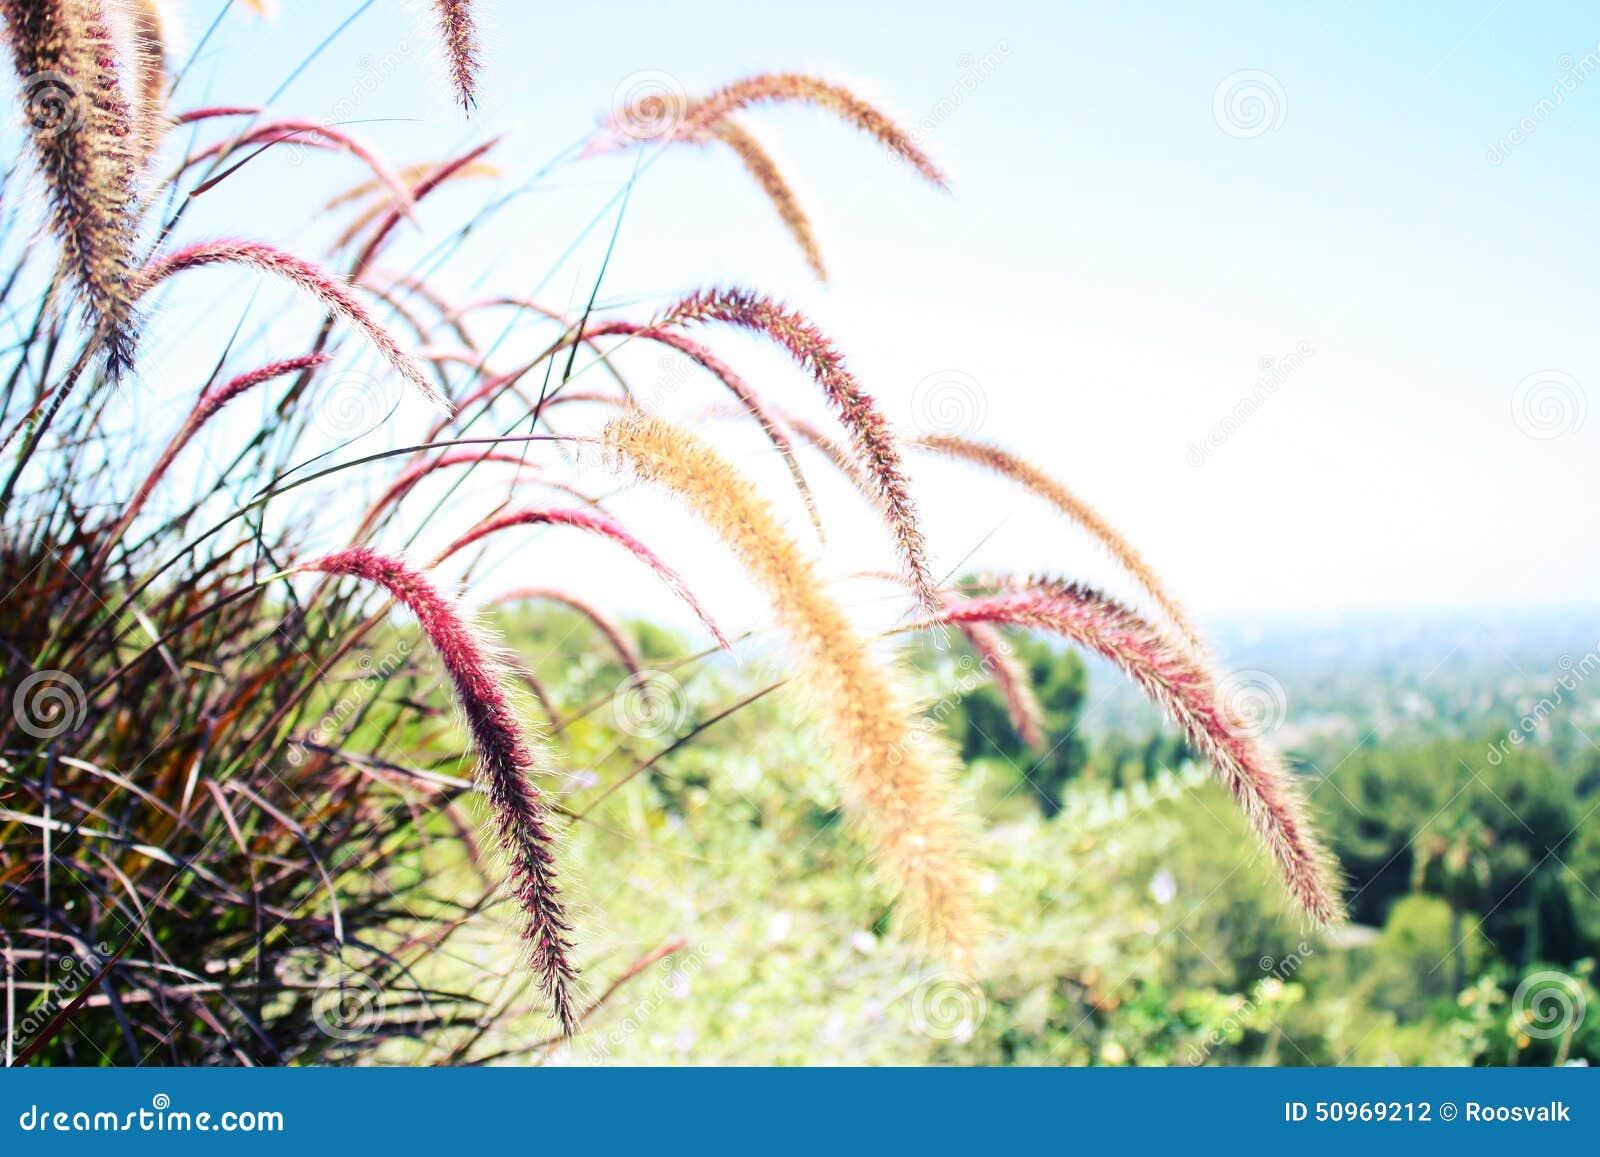 Ornamental Grasses in a Californian Garden